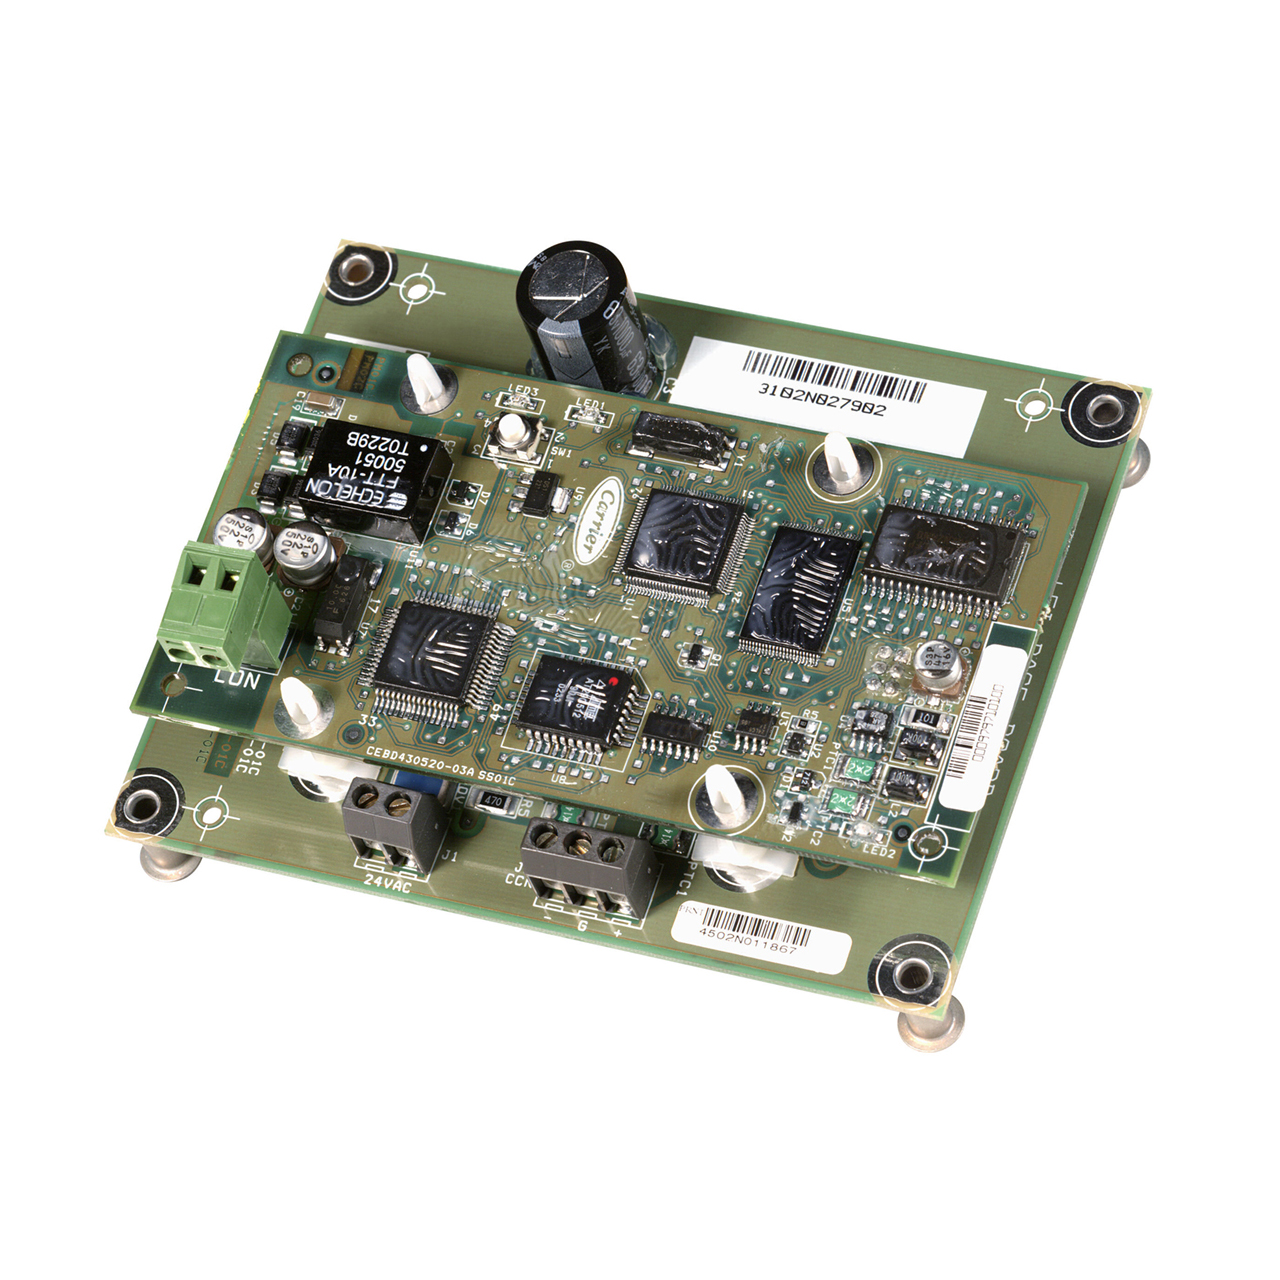 carrier-33CNTRANLON-01-R-lonworks-carrier-translator-product-integrated-controller